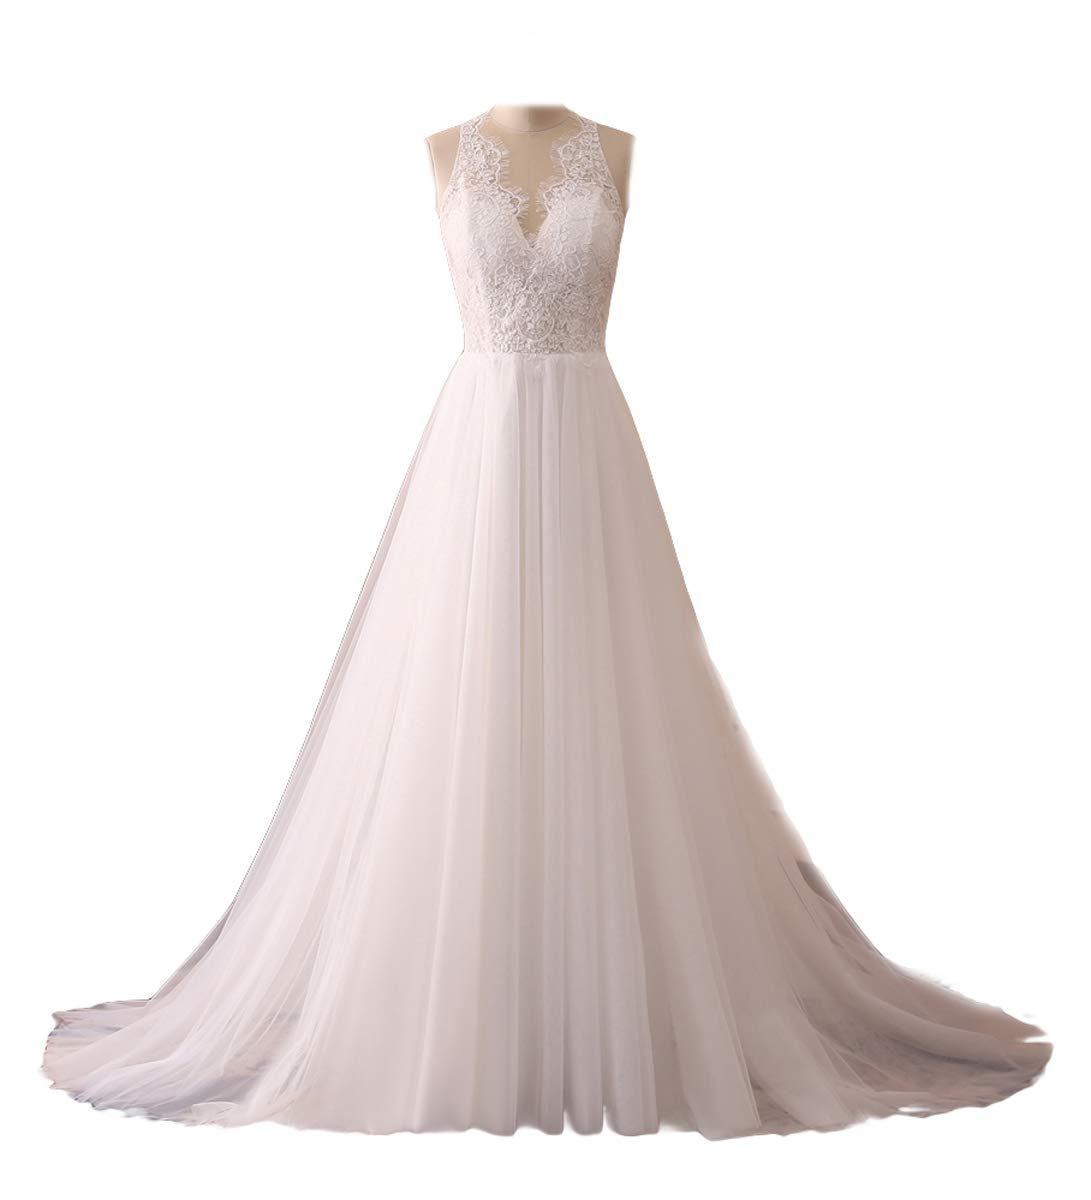 ASA Bridal Women's Vintage Cap Sleeve Lace Wedding Dress A Line Evening Gown product image